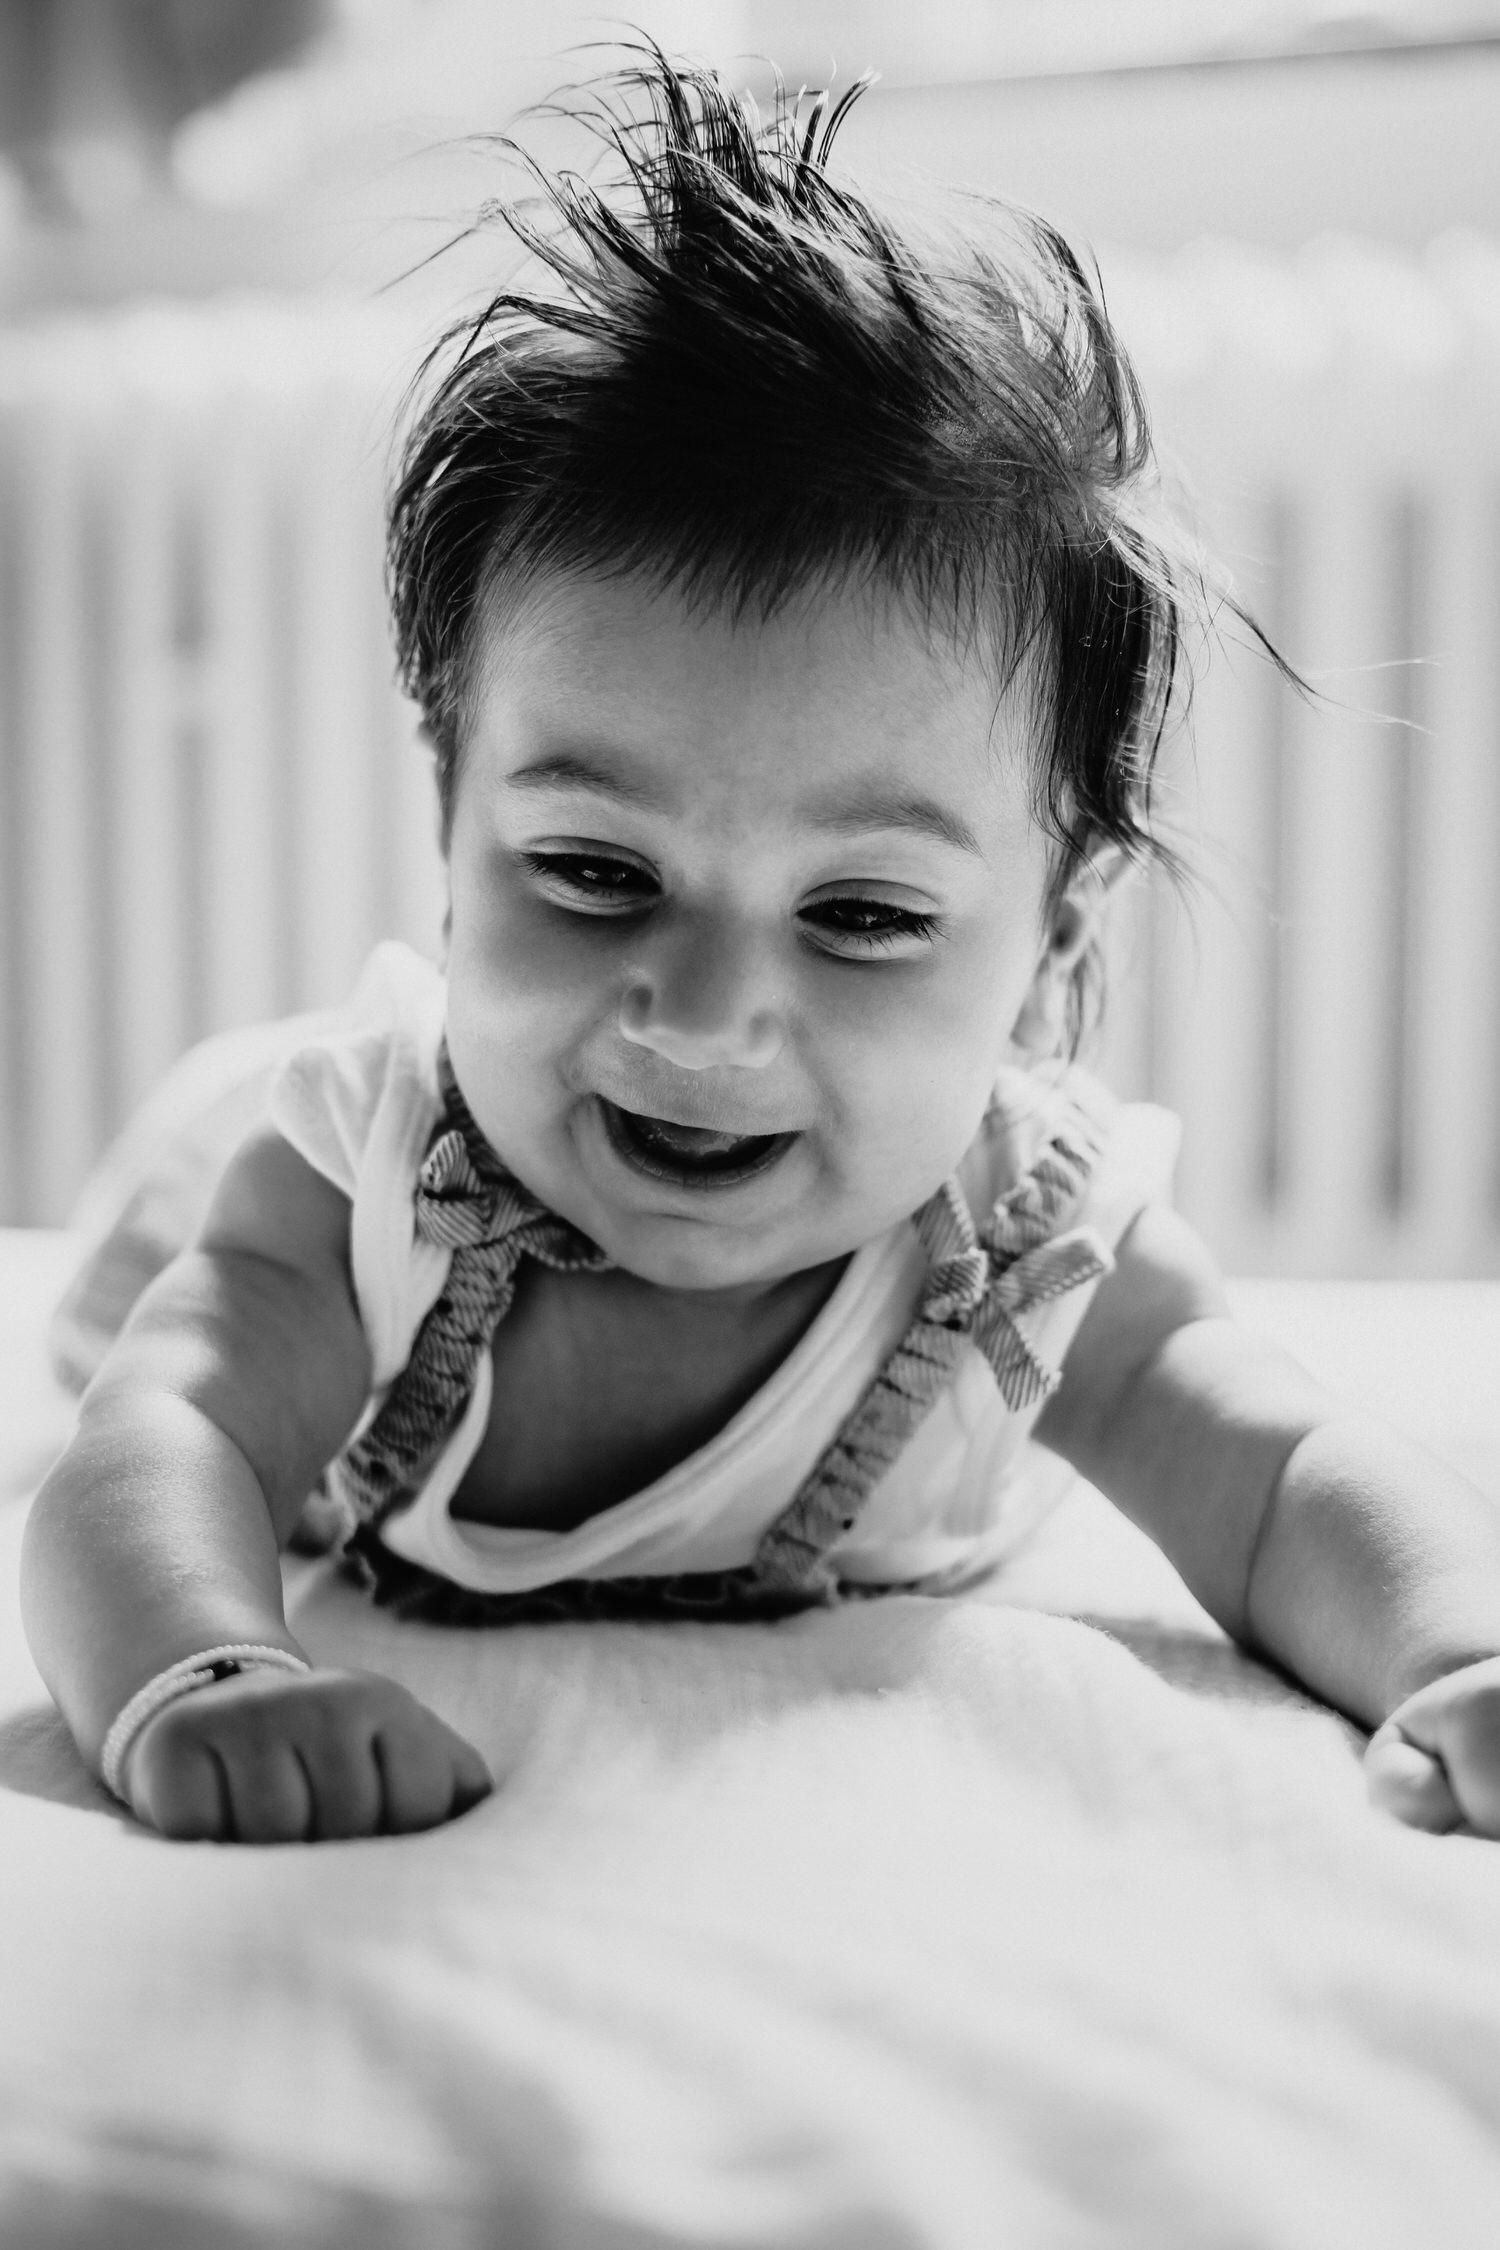 Baby mit 3 Monaten